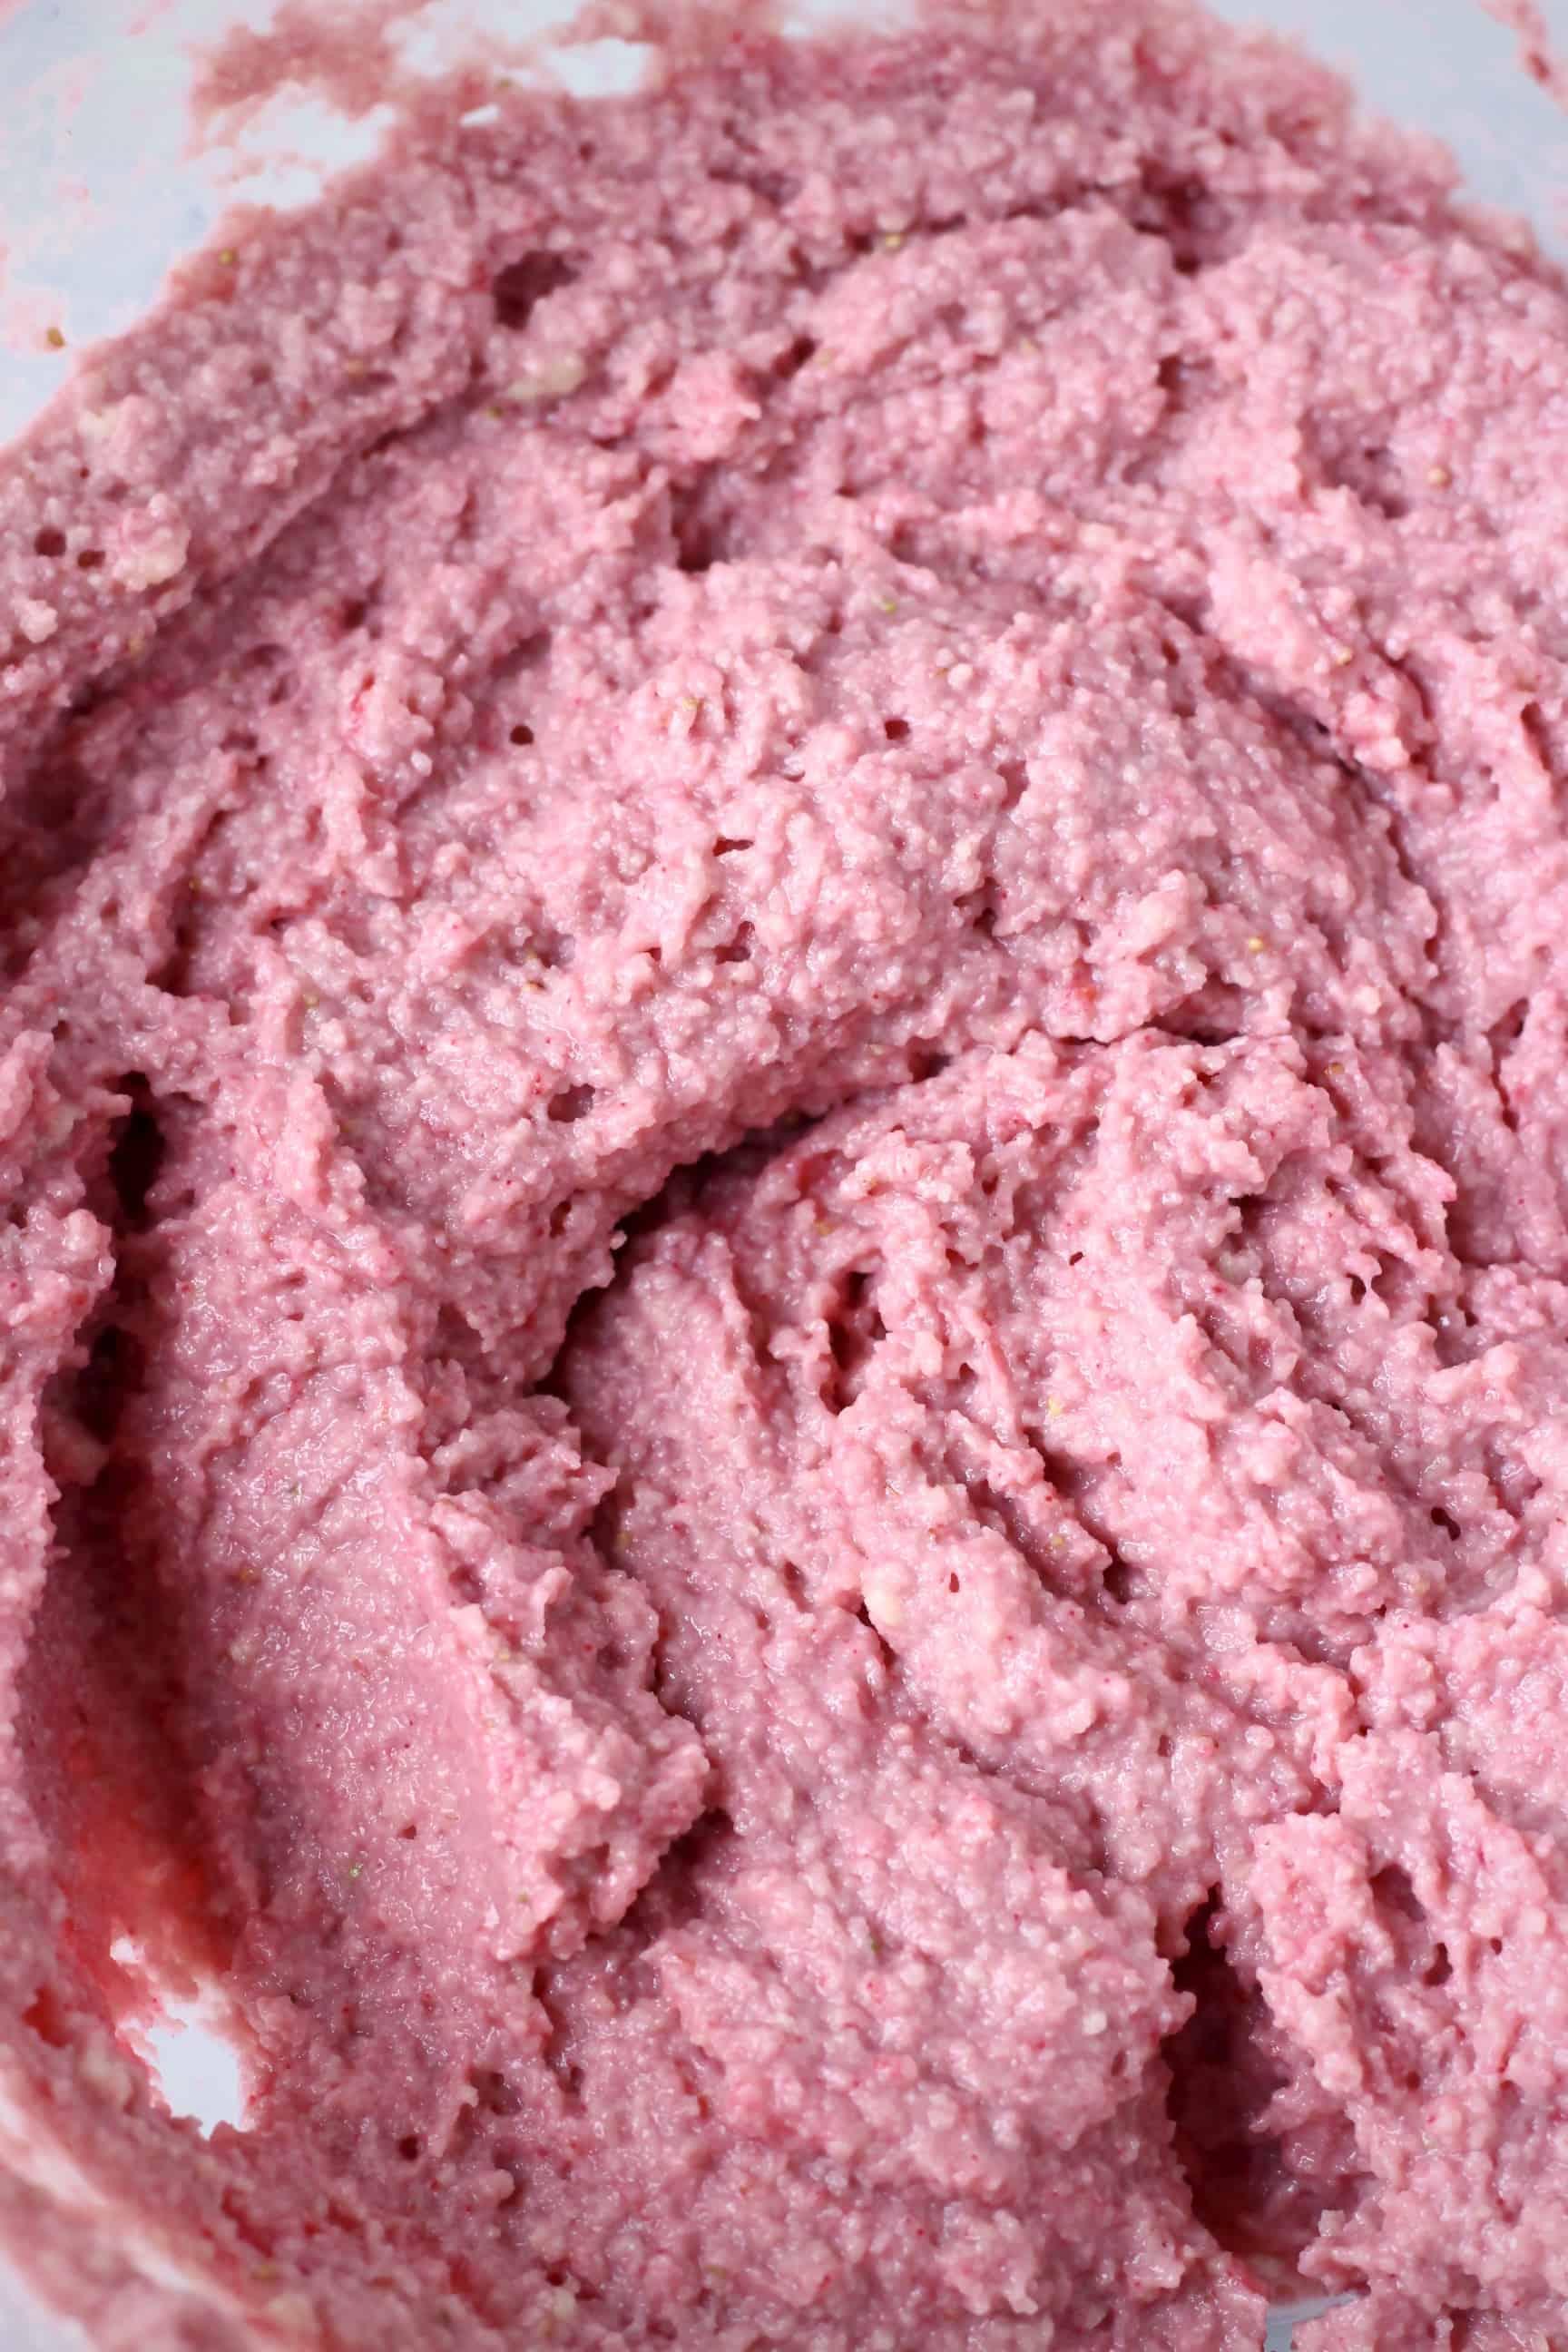 Raw pink gluten-free vegan strawberry cake batter in a bowl